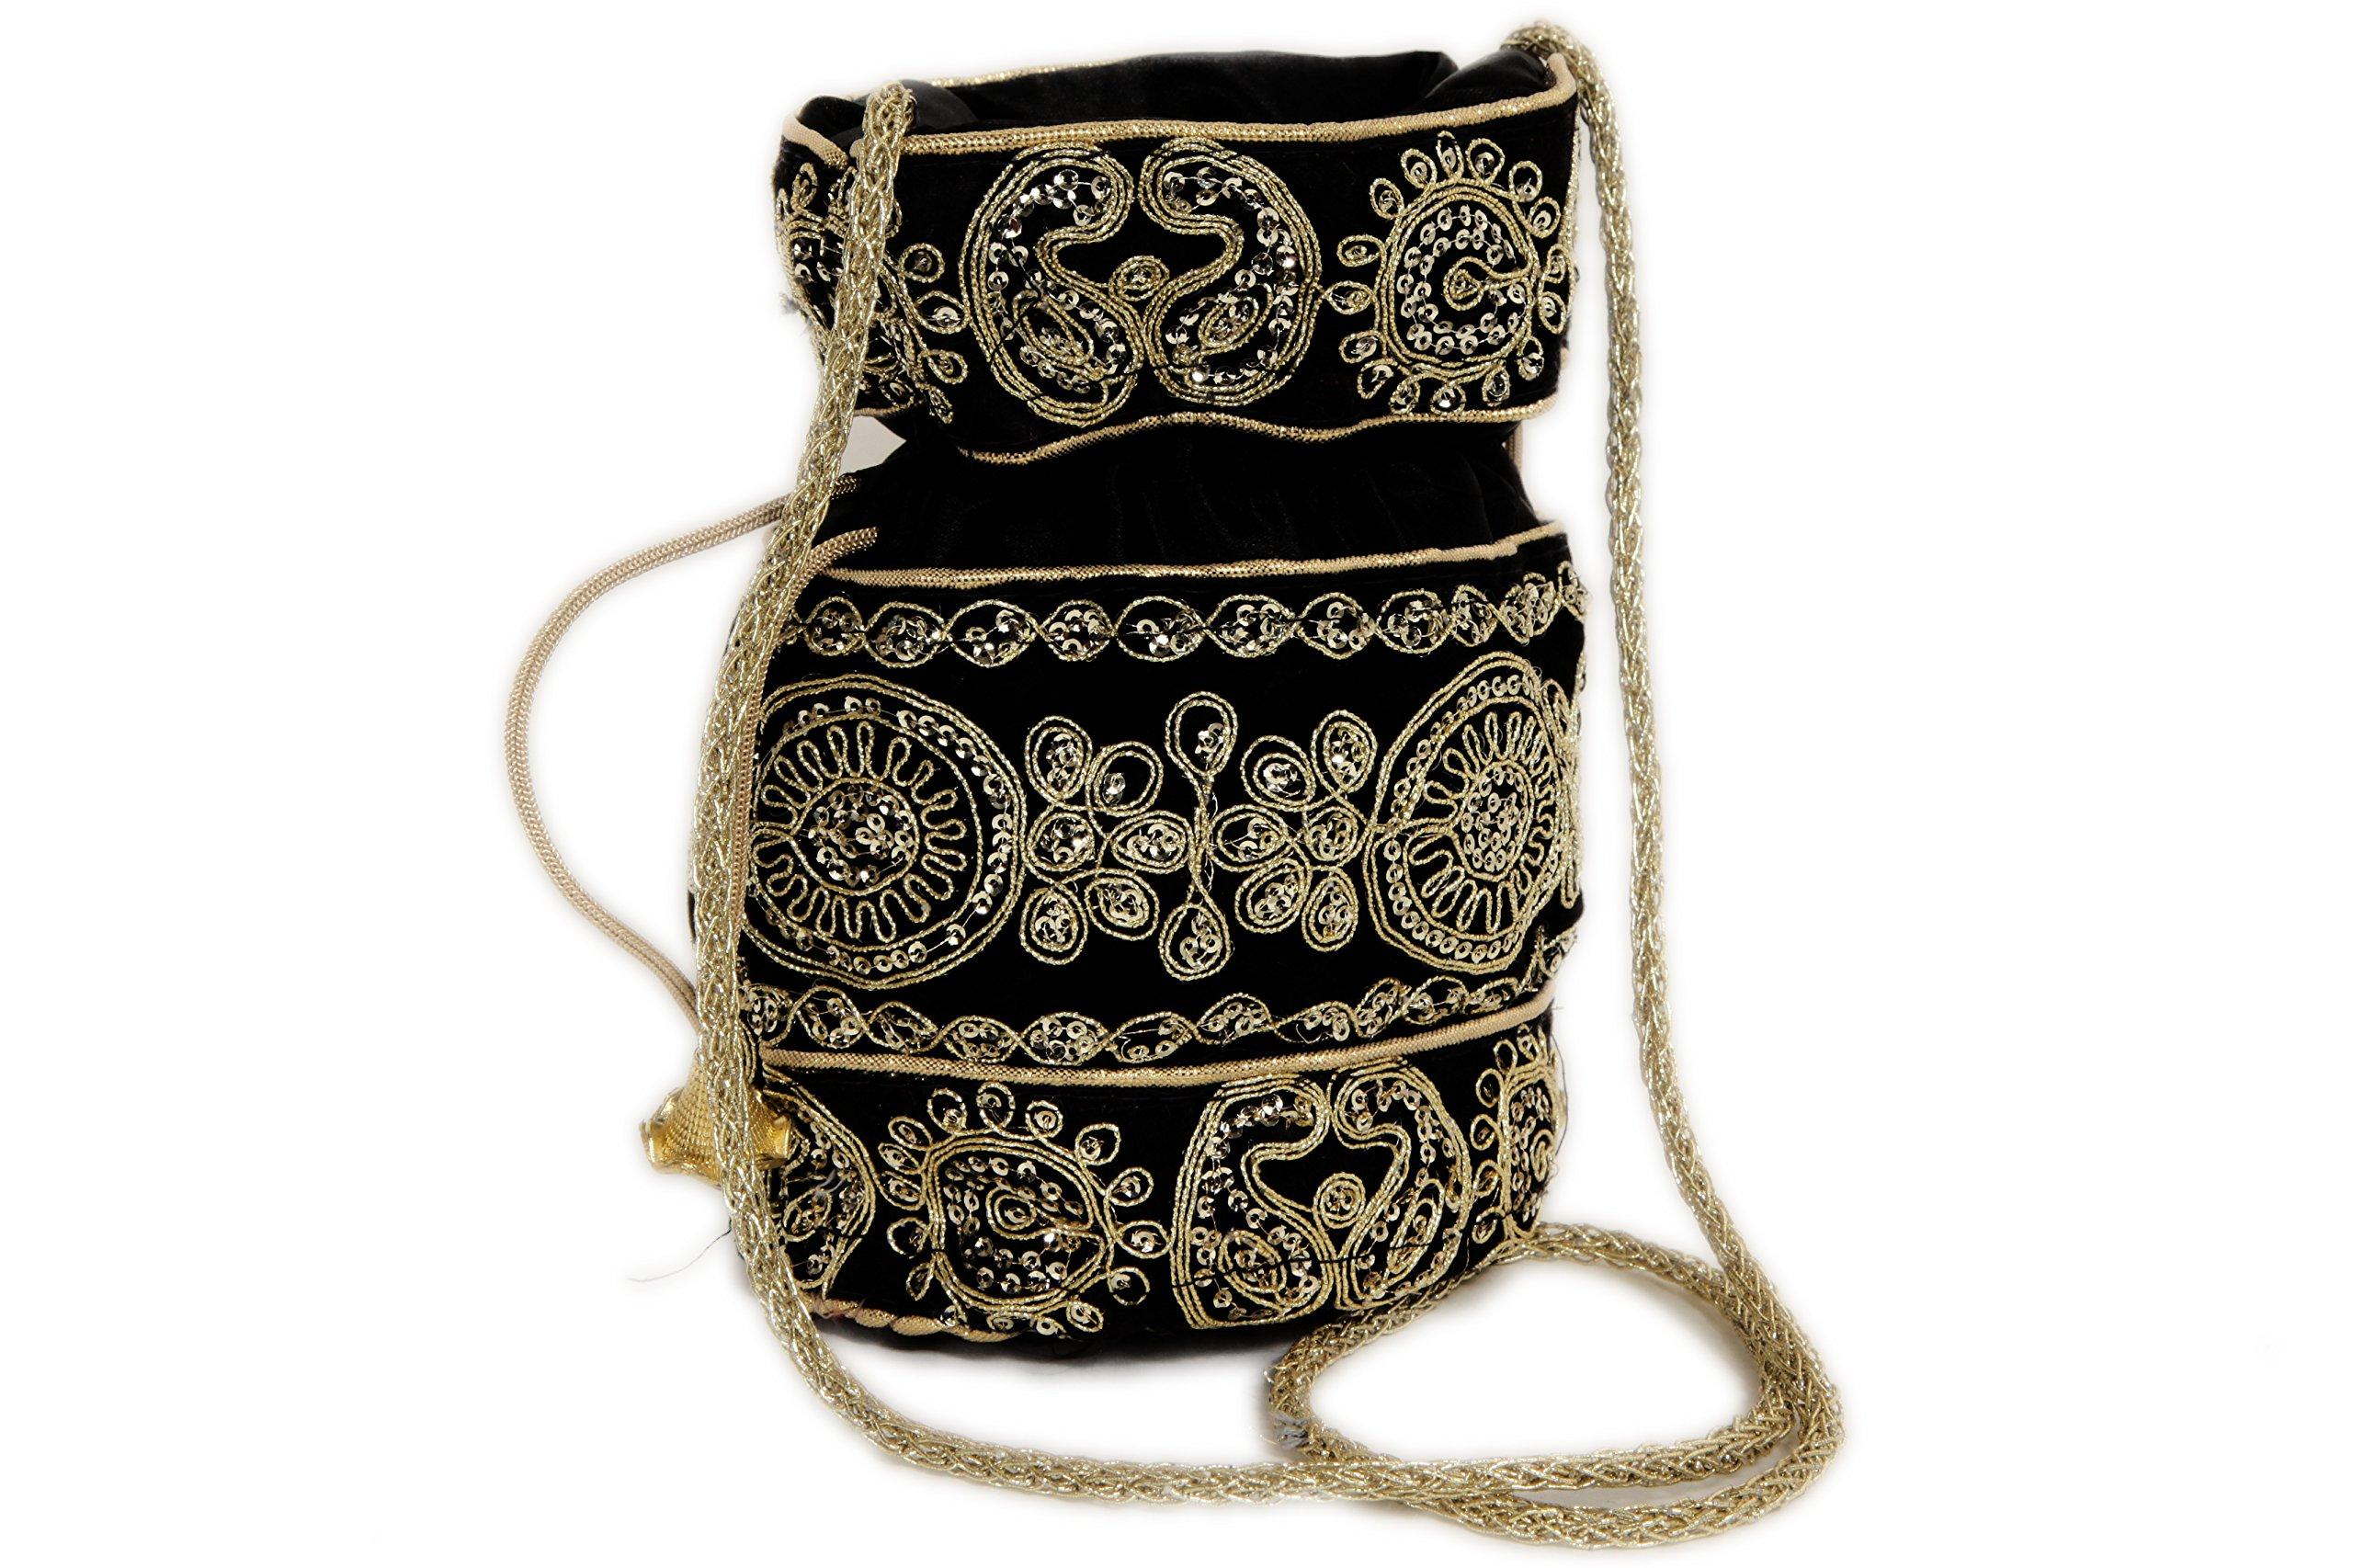 Indian Satin Potli Bag with Attractive Handicraft Thread Work for Female - Black